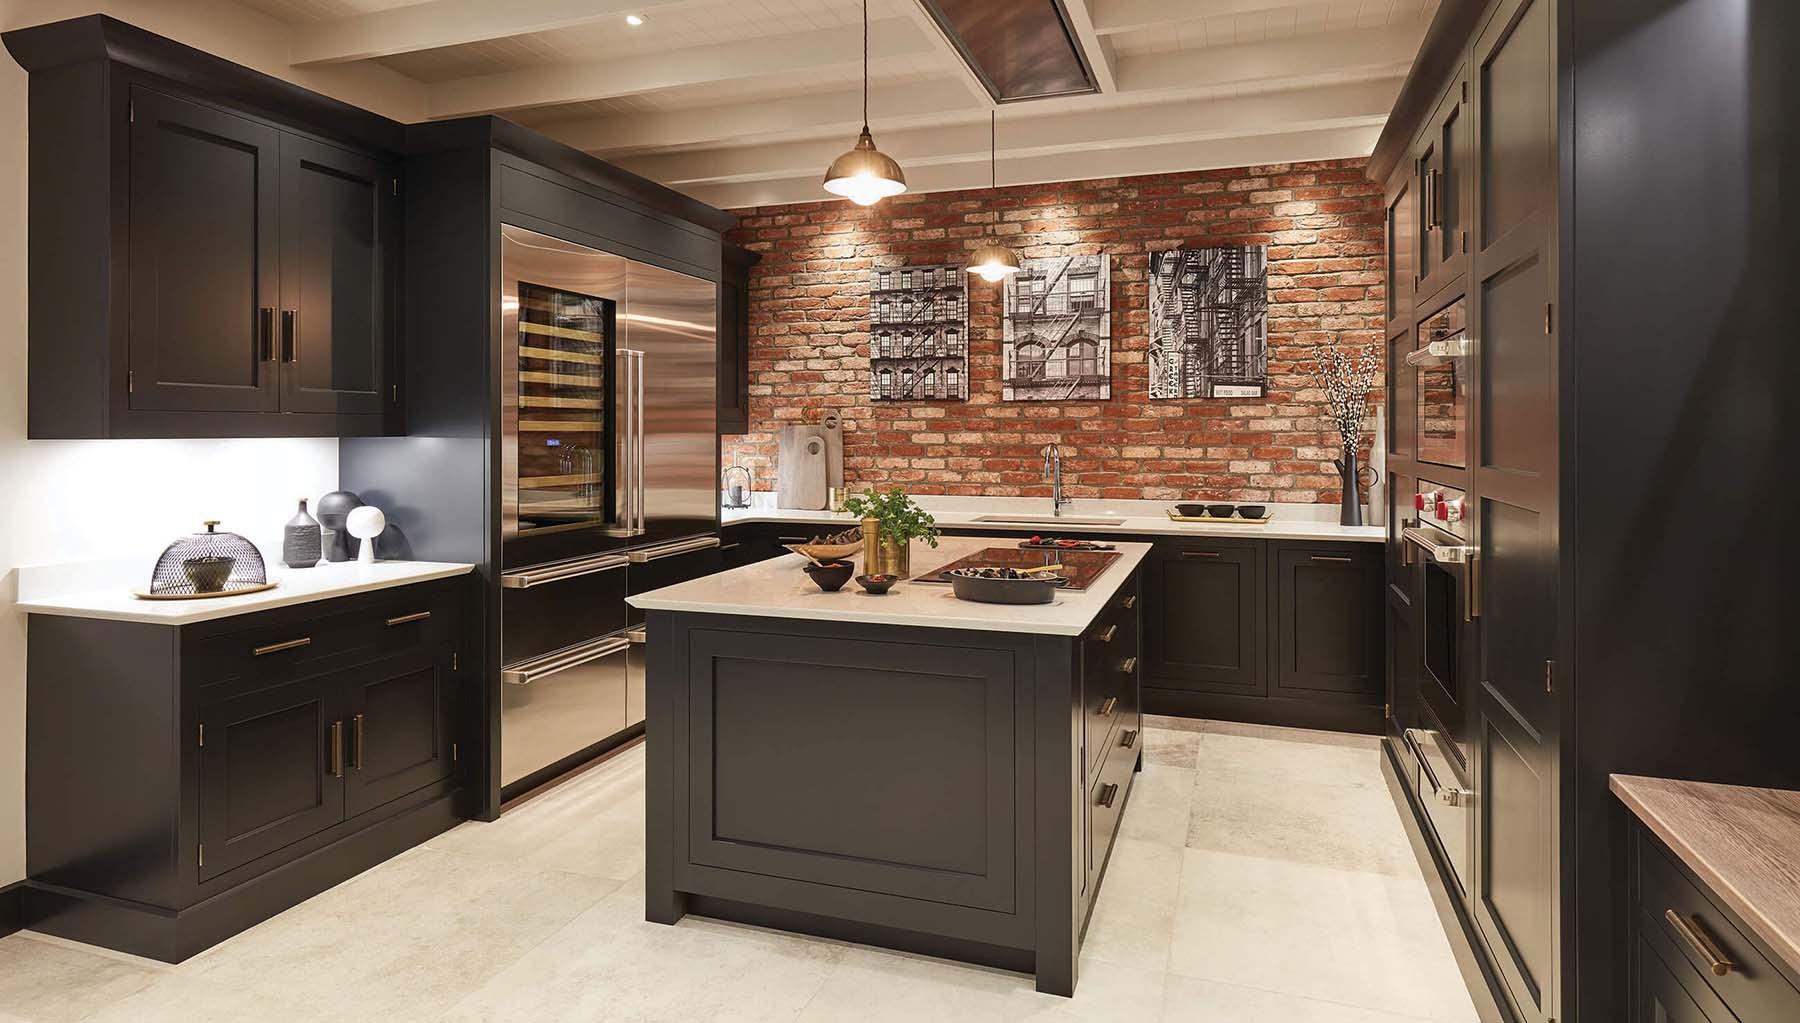 black kitchen cabinets red brick backsplash with artwork white countertops stainless steel appliances